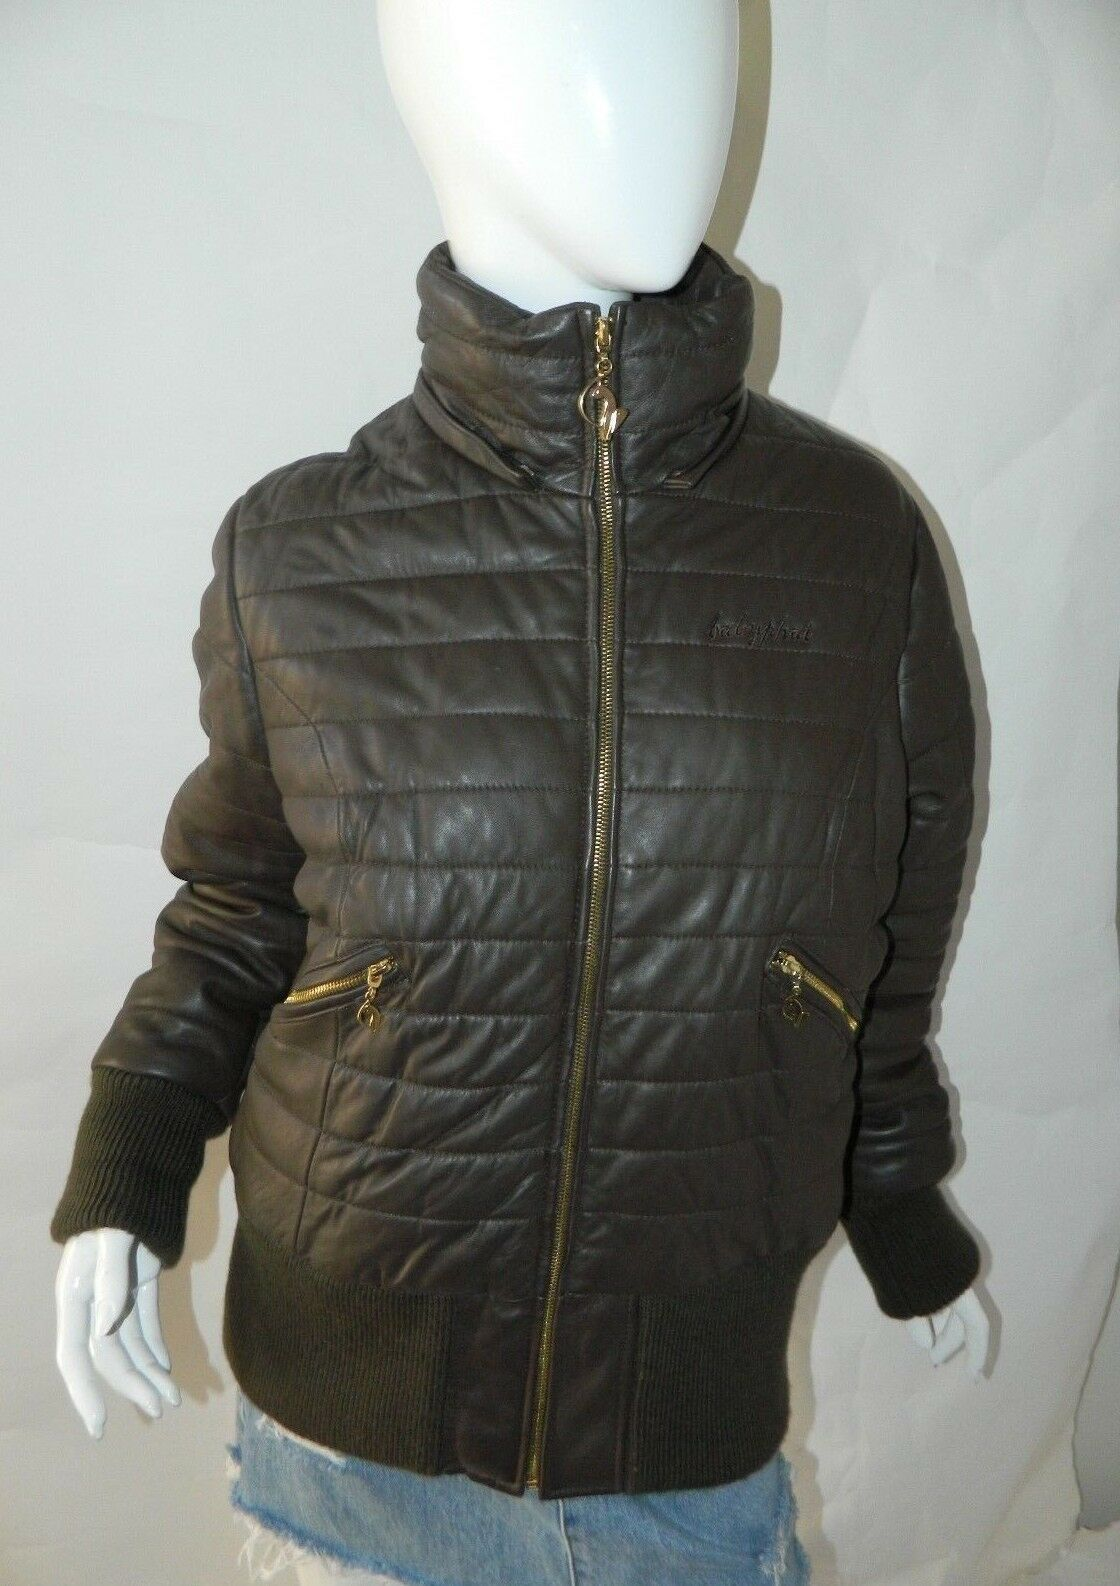 BABY PHAT Jacket Puffer Leather Kimora Lee Simmons Brown Coat XX-Large image 6